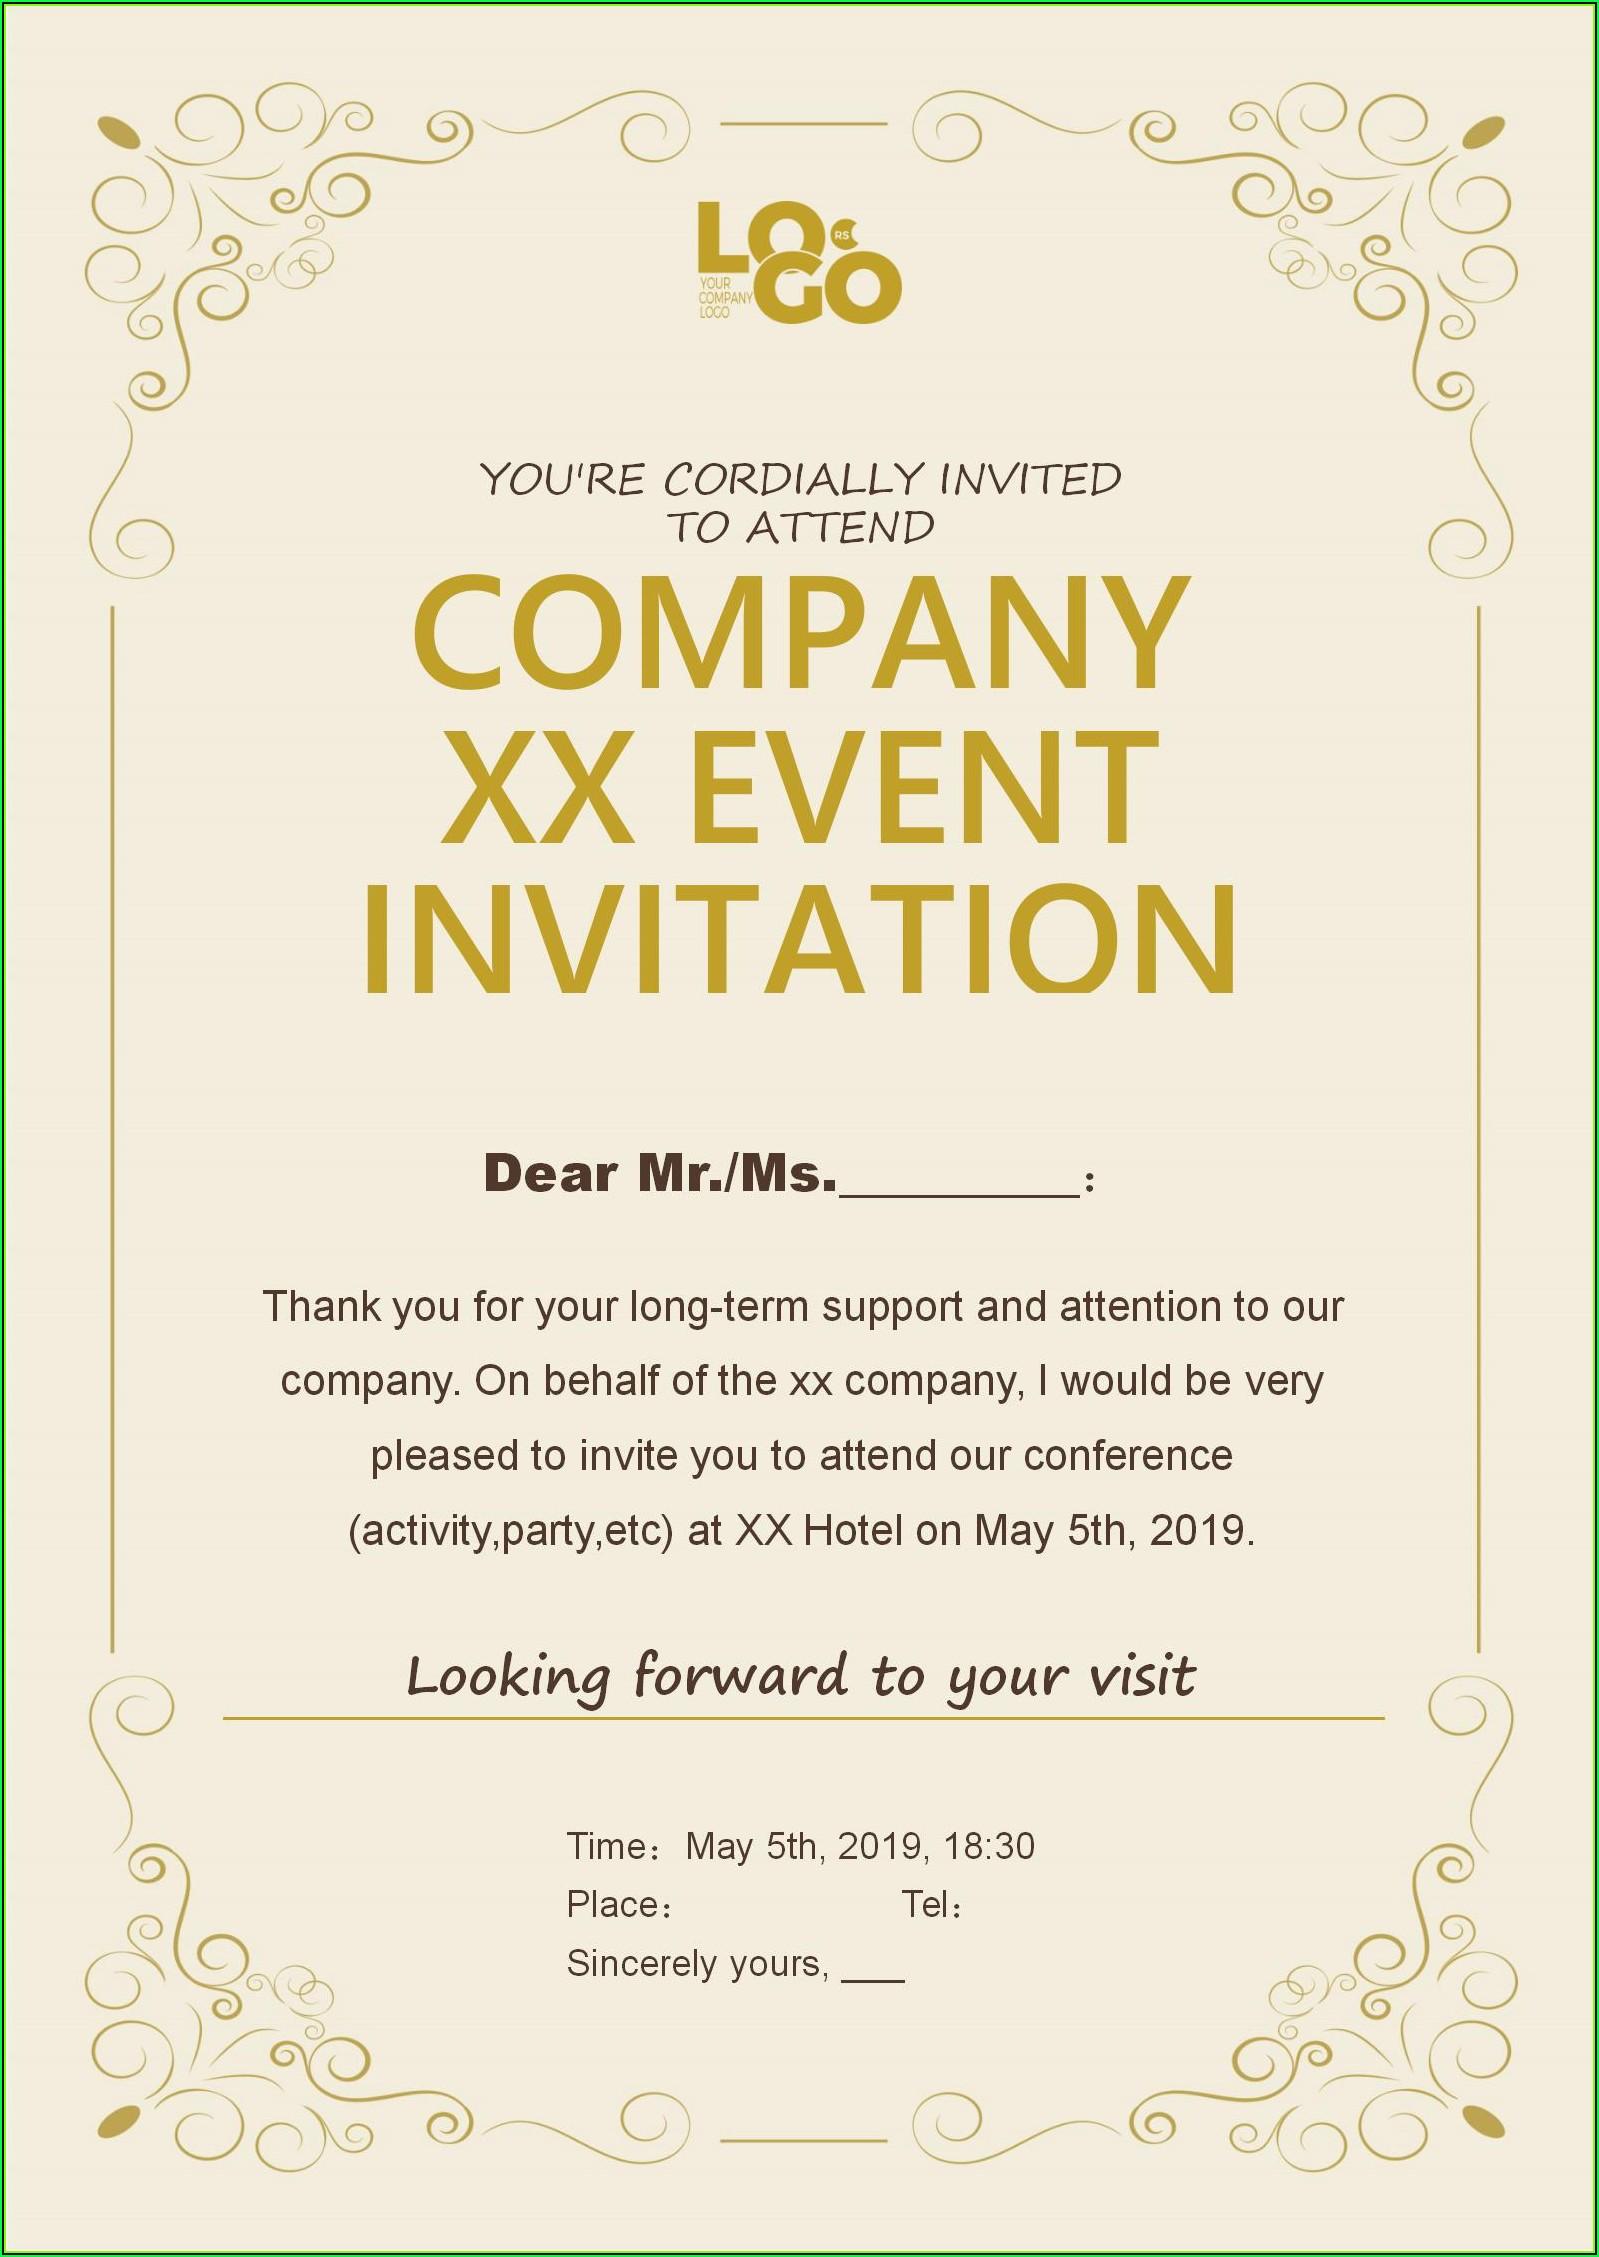 Corporate Event Invitation Templates Free Download